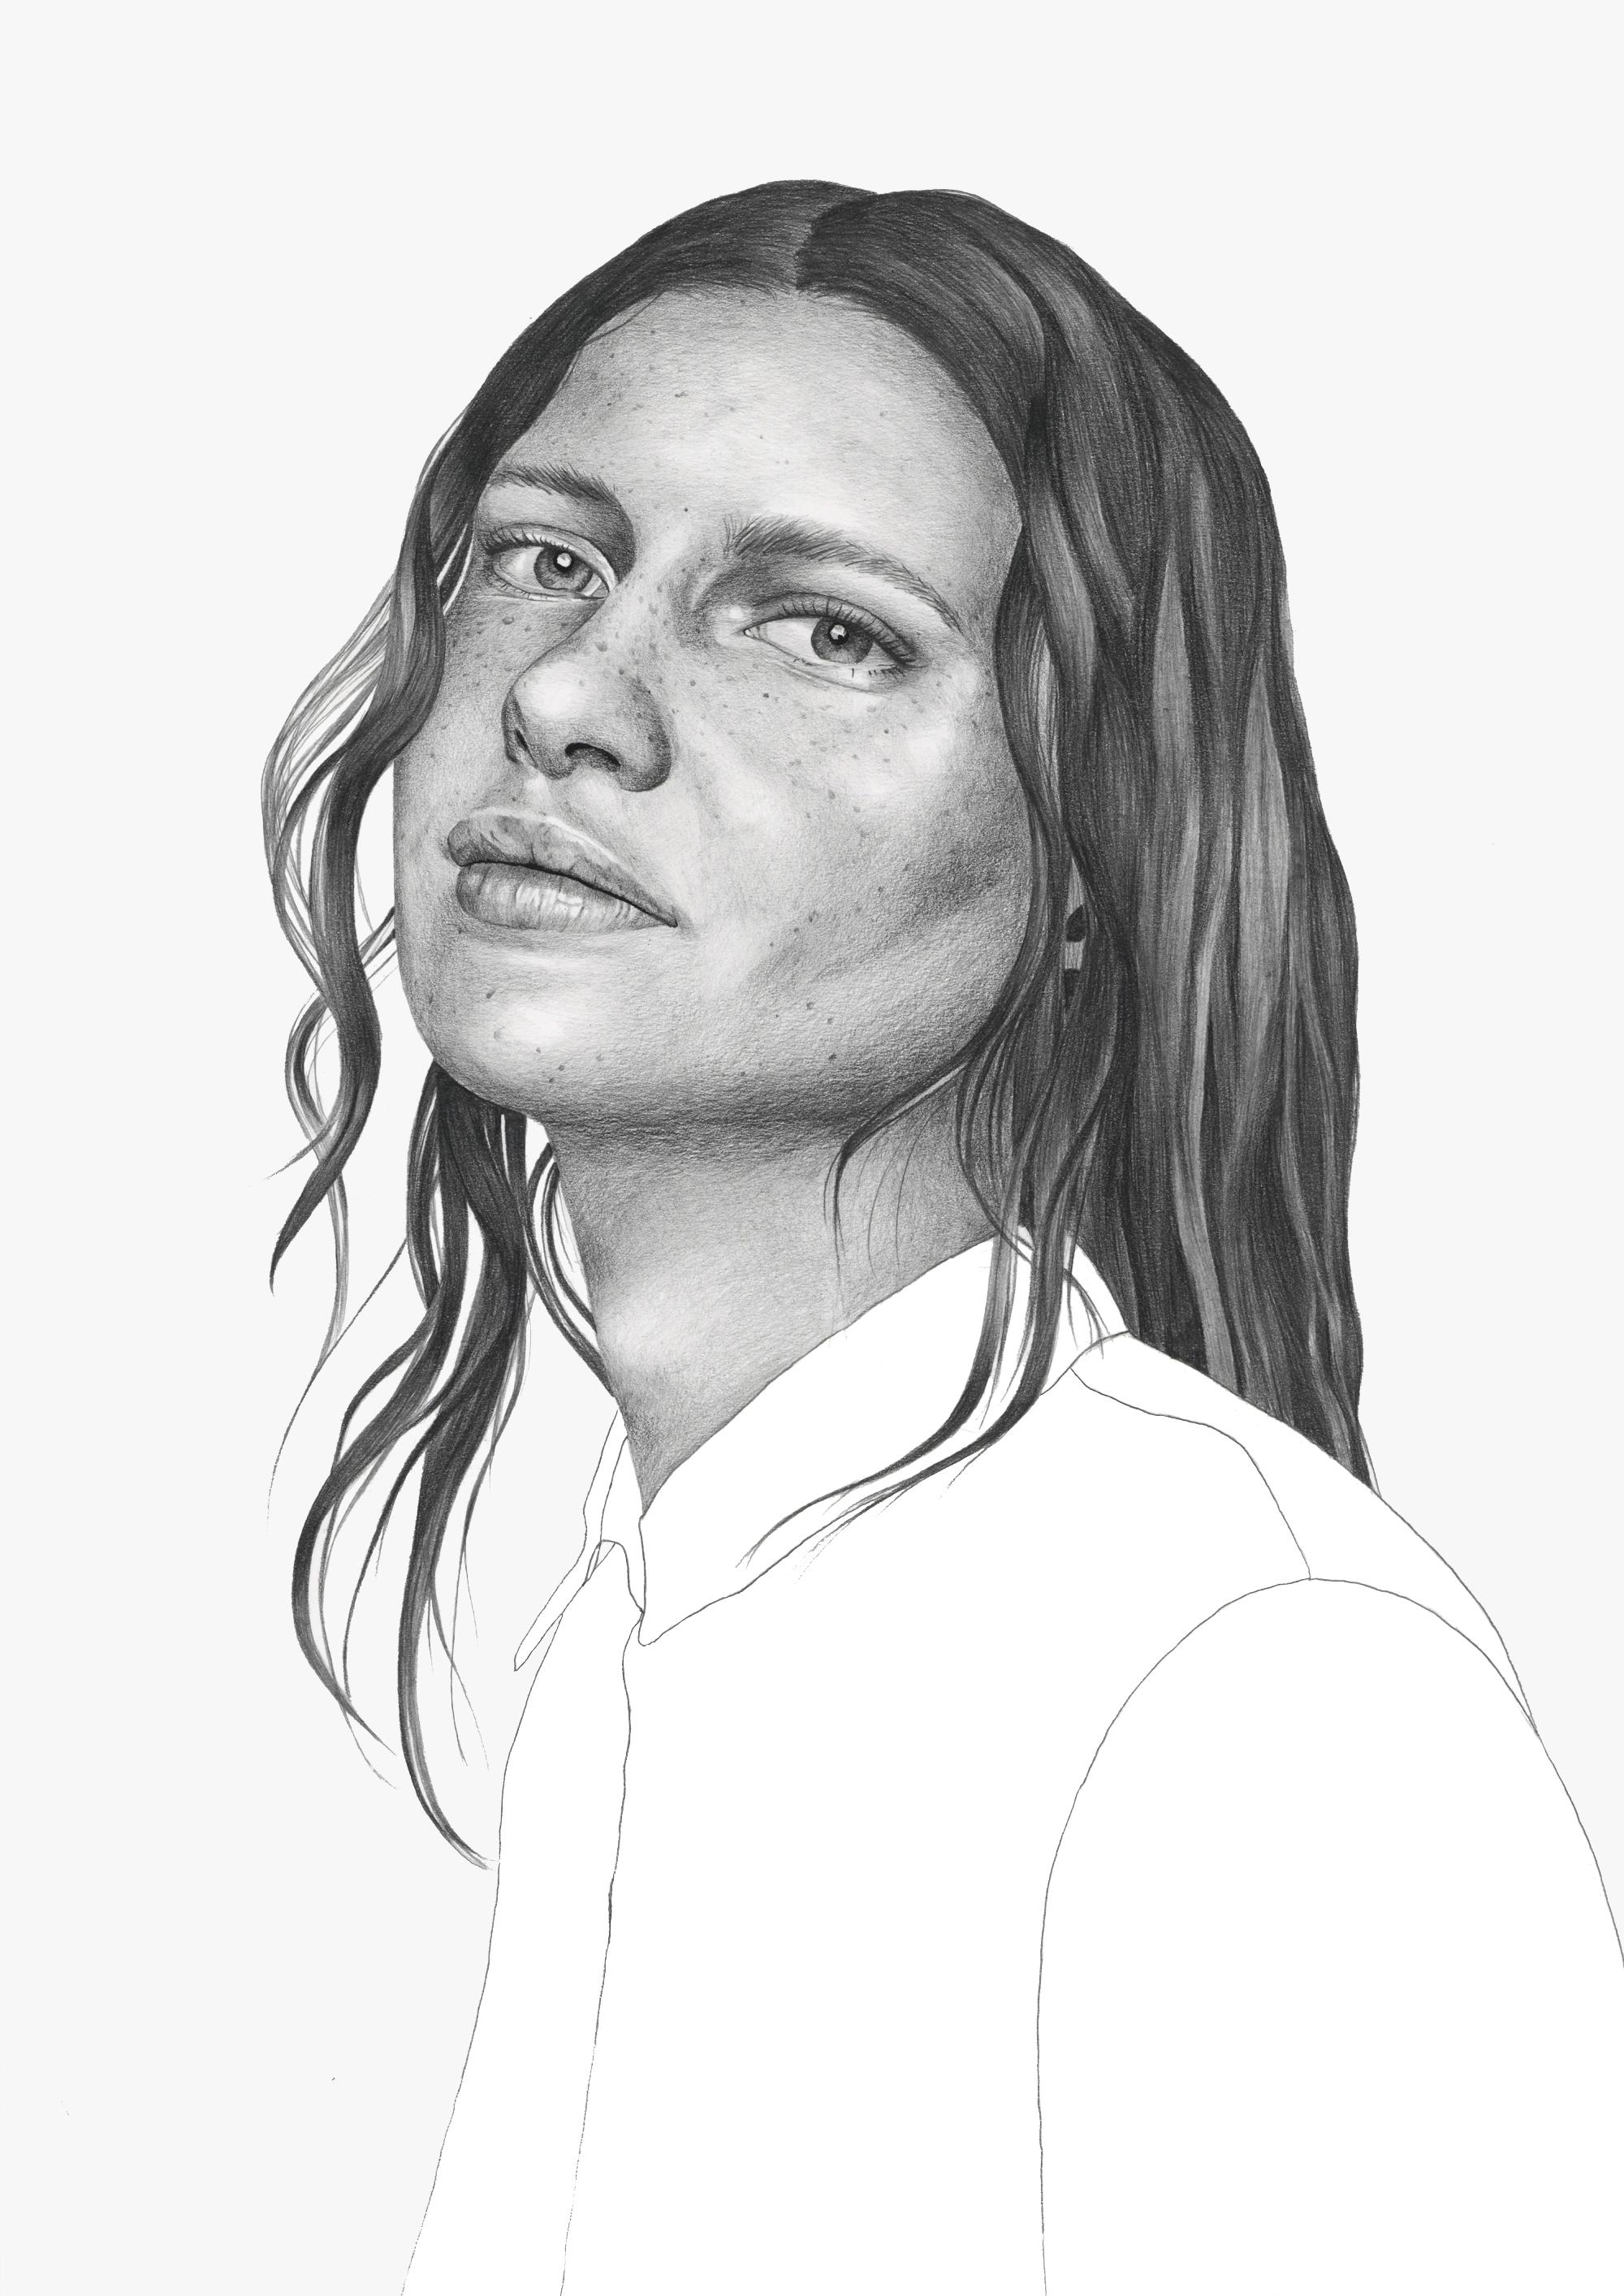 Graphite pencil fashion illustration by Alison Sargent